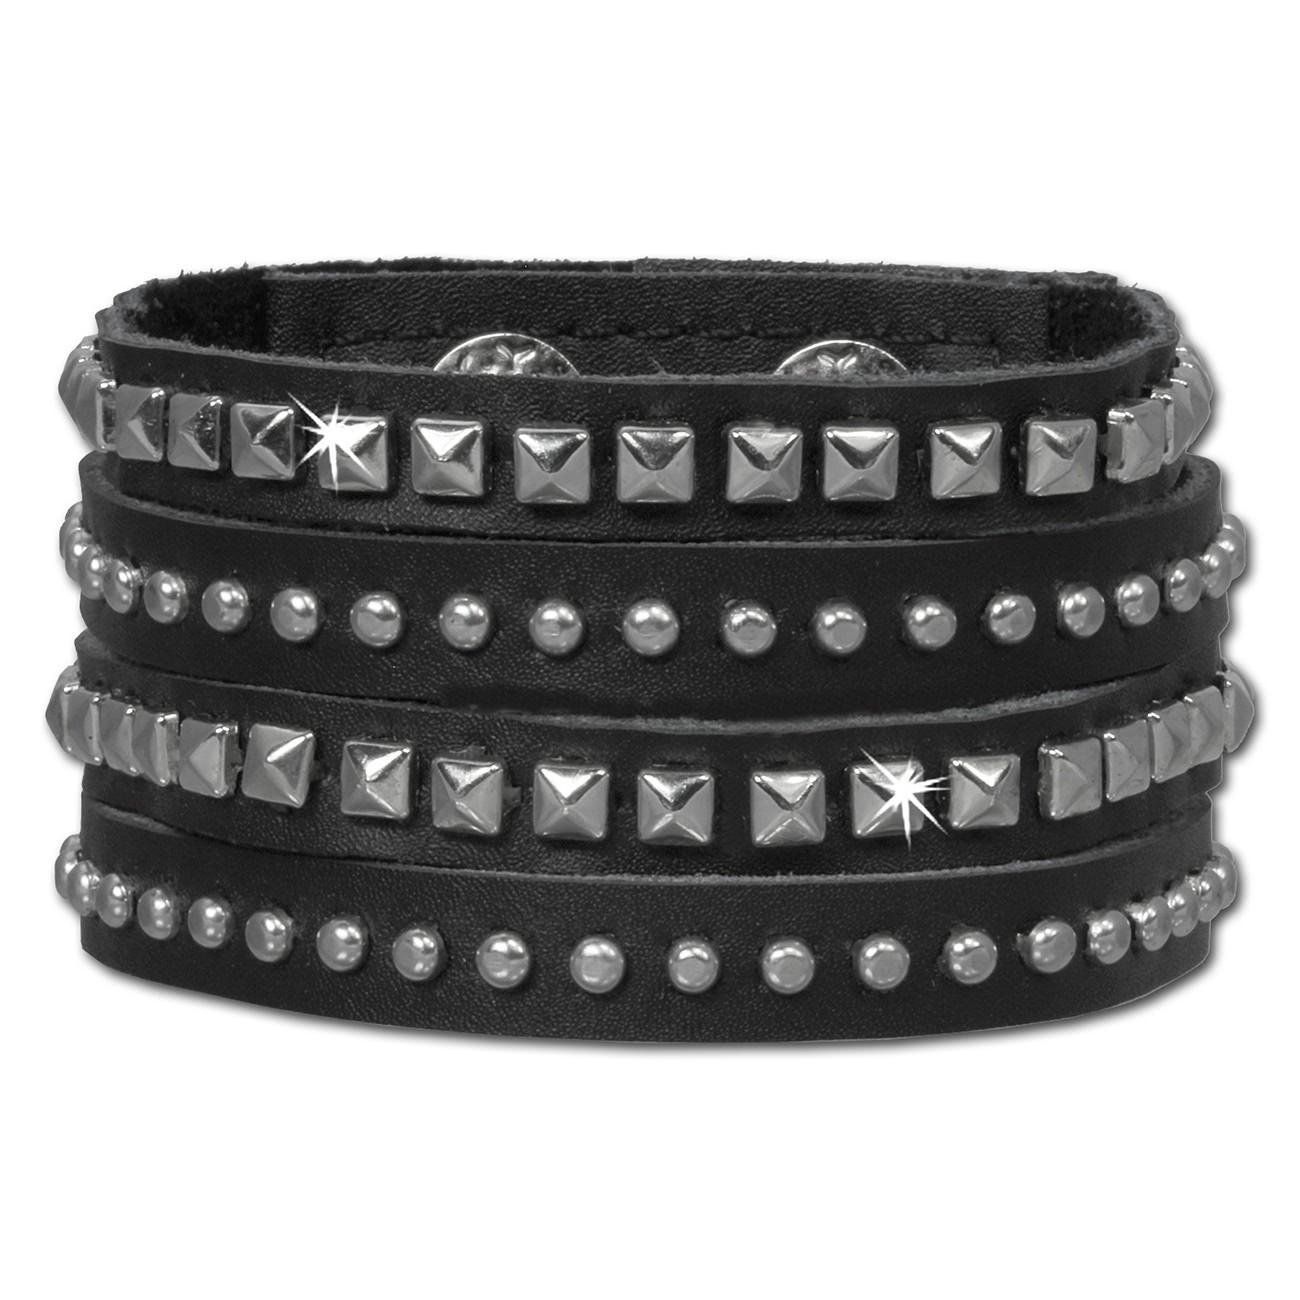 SilberDream Nieten-Lederarmband schwarz Damen Leder Armband LAP512S